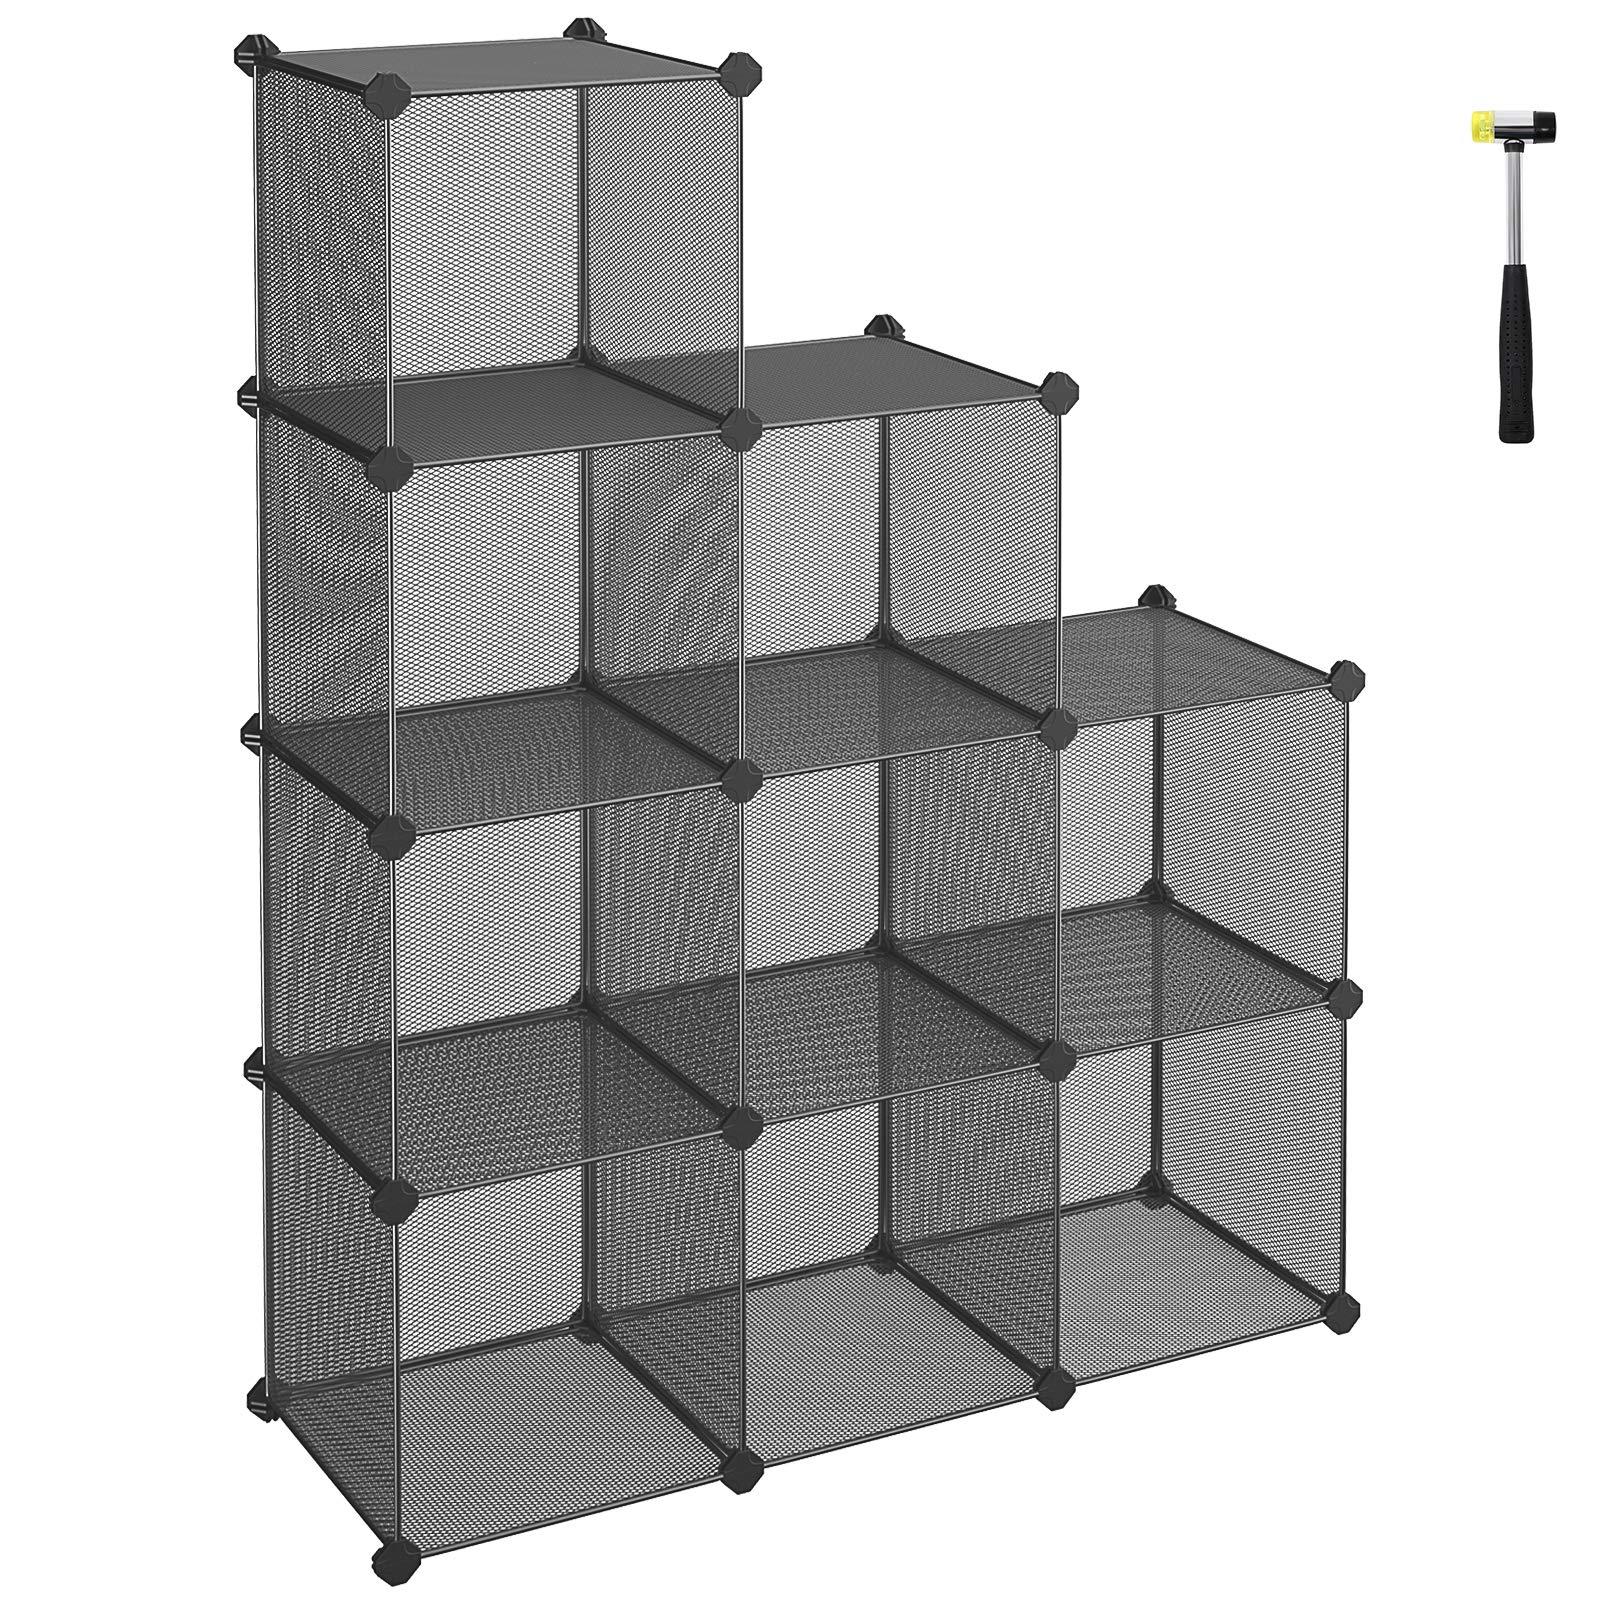 SONGMICS 9-Cube Metal Mesh Storage Cube, Book Shelf, Modular Bookcase, DIY Closet Cabinet Organizer for Books, Plants, Toys, Shoes, Clothes 36.6''L x 12.2''W x 48.4''H, Gray ULPL115G by SONGMICS (Image #1)